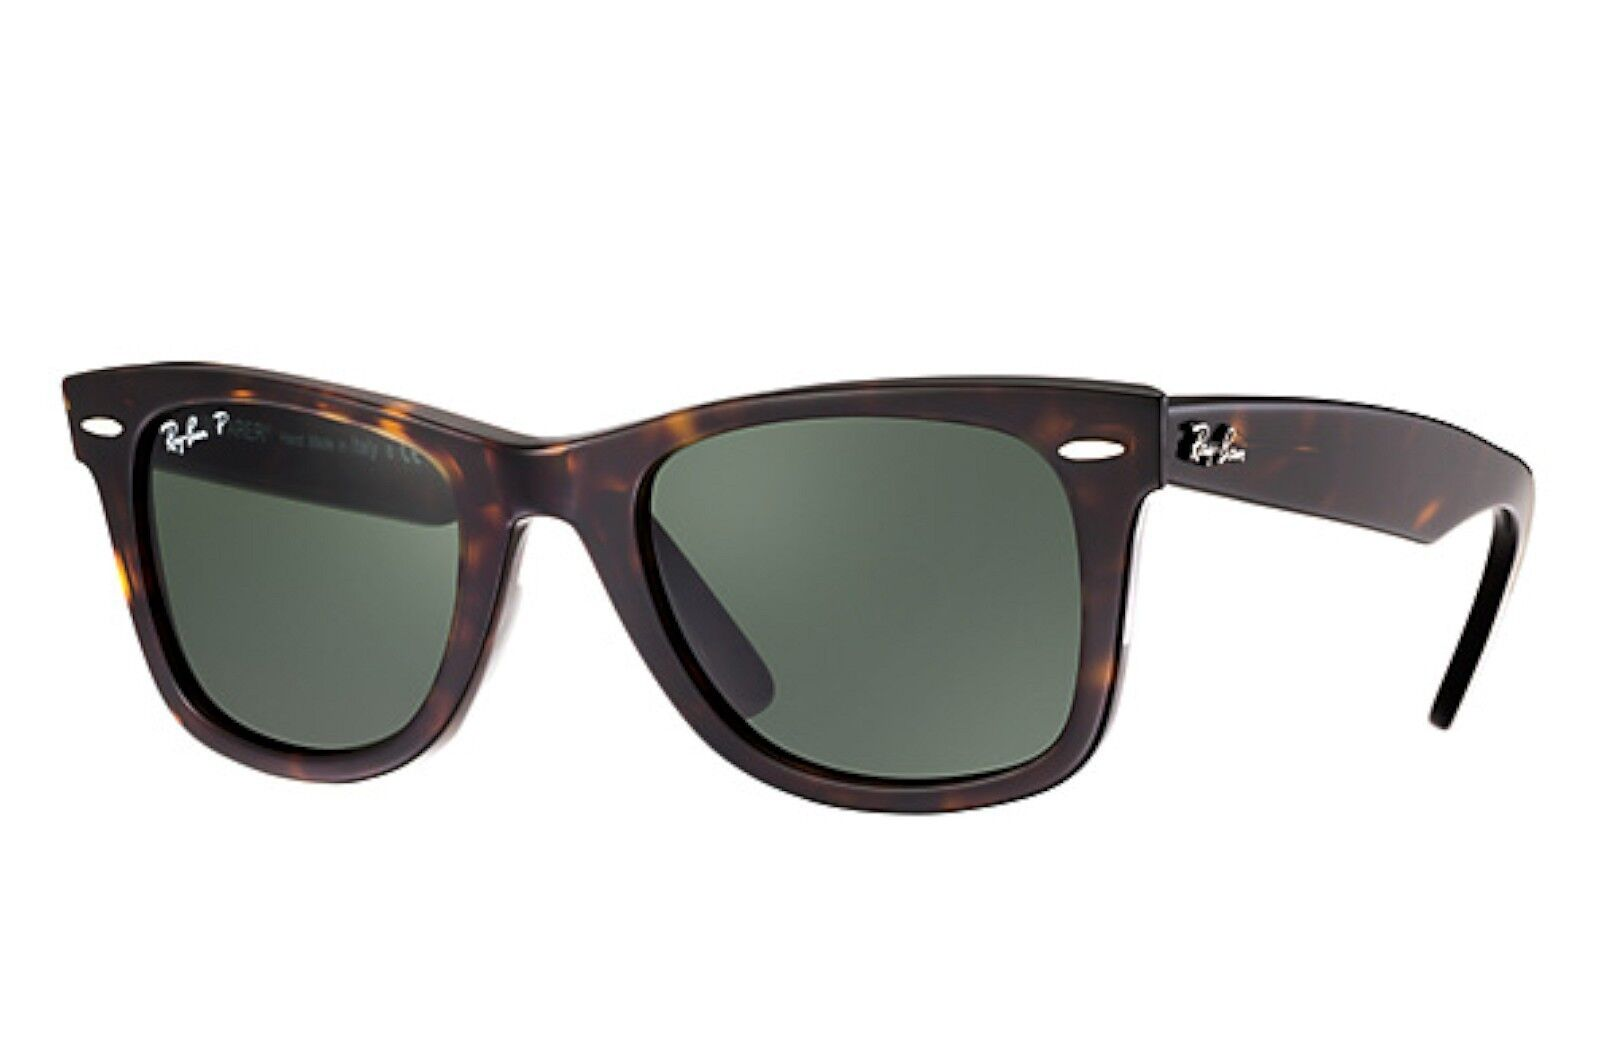 05734f8480 spain genuine ray ban rb2140 902 58 unisex wayfarer tortoise polarized  sunglasses c2f20 9cde6